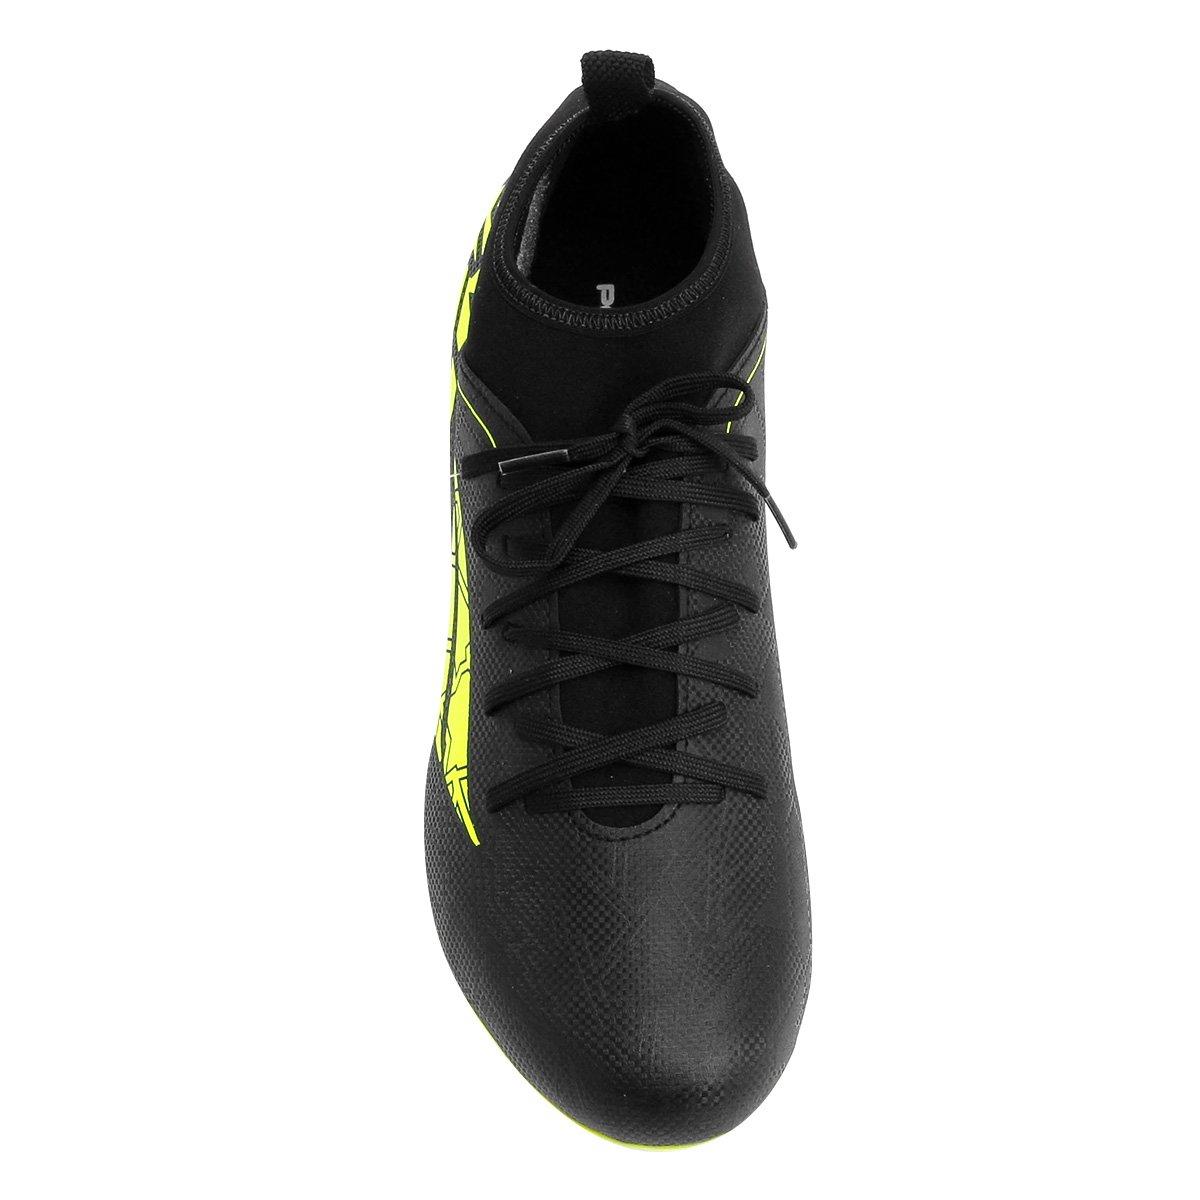 Chuteira Campo Penalty RX Locker VII - Preto e Amarelo - Compre ... da026ca2a80a0